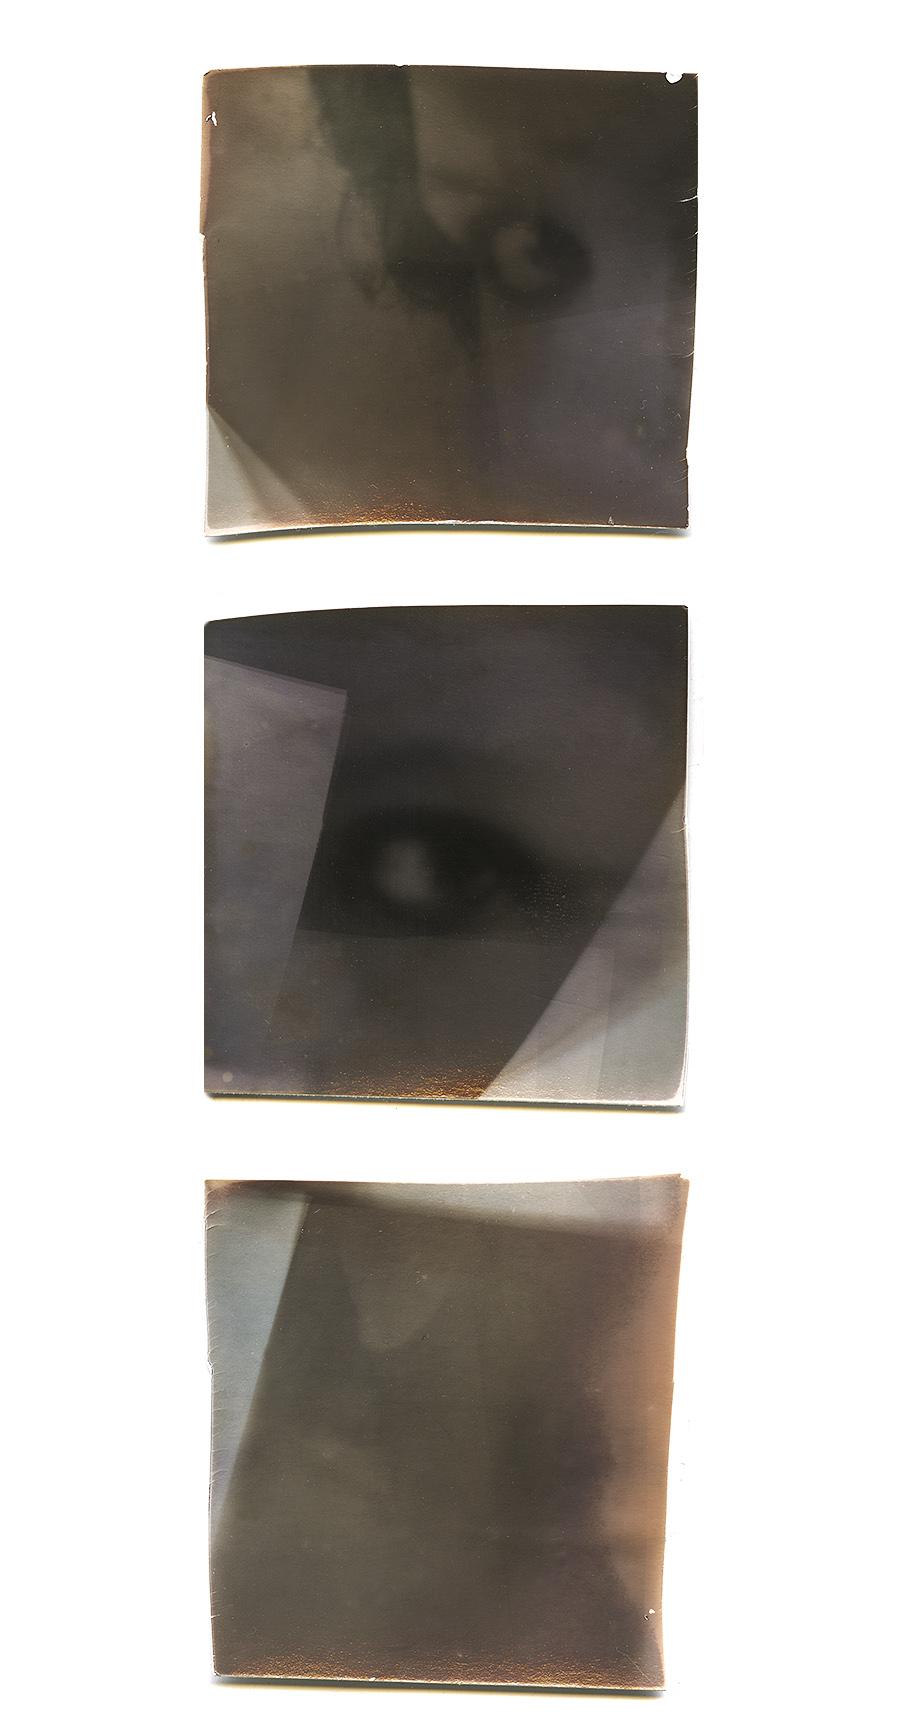 untitled (Mistake) #1.0